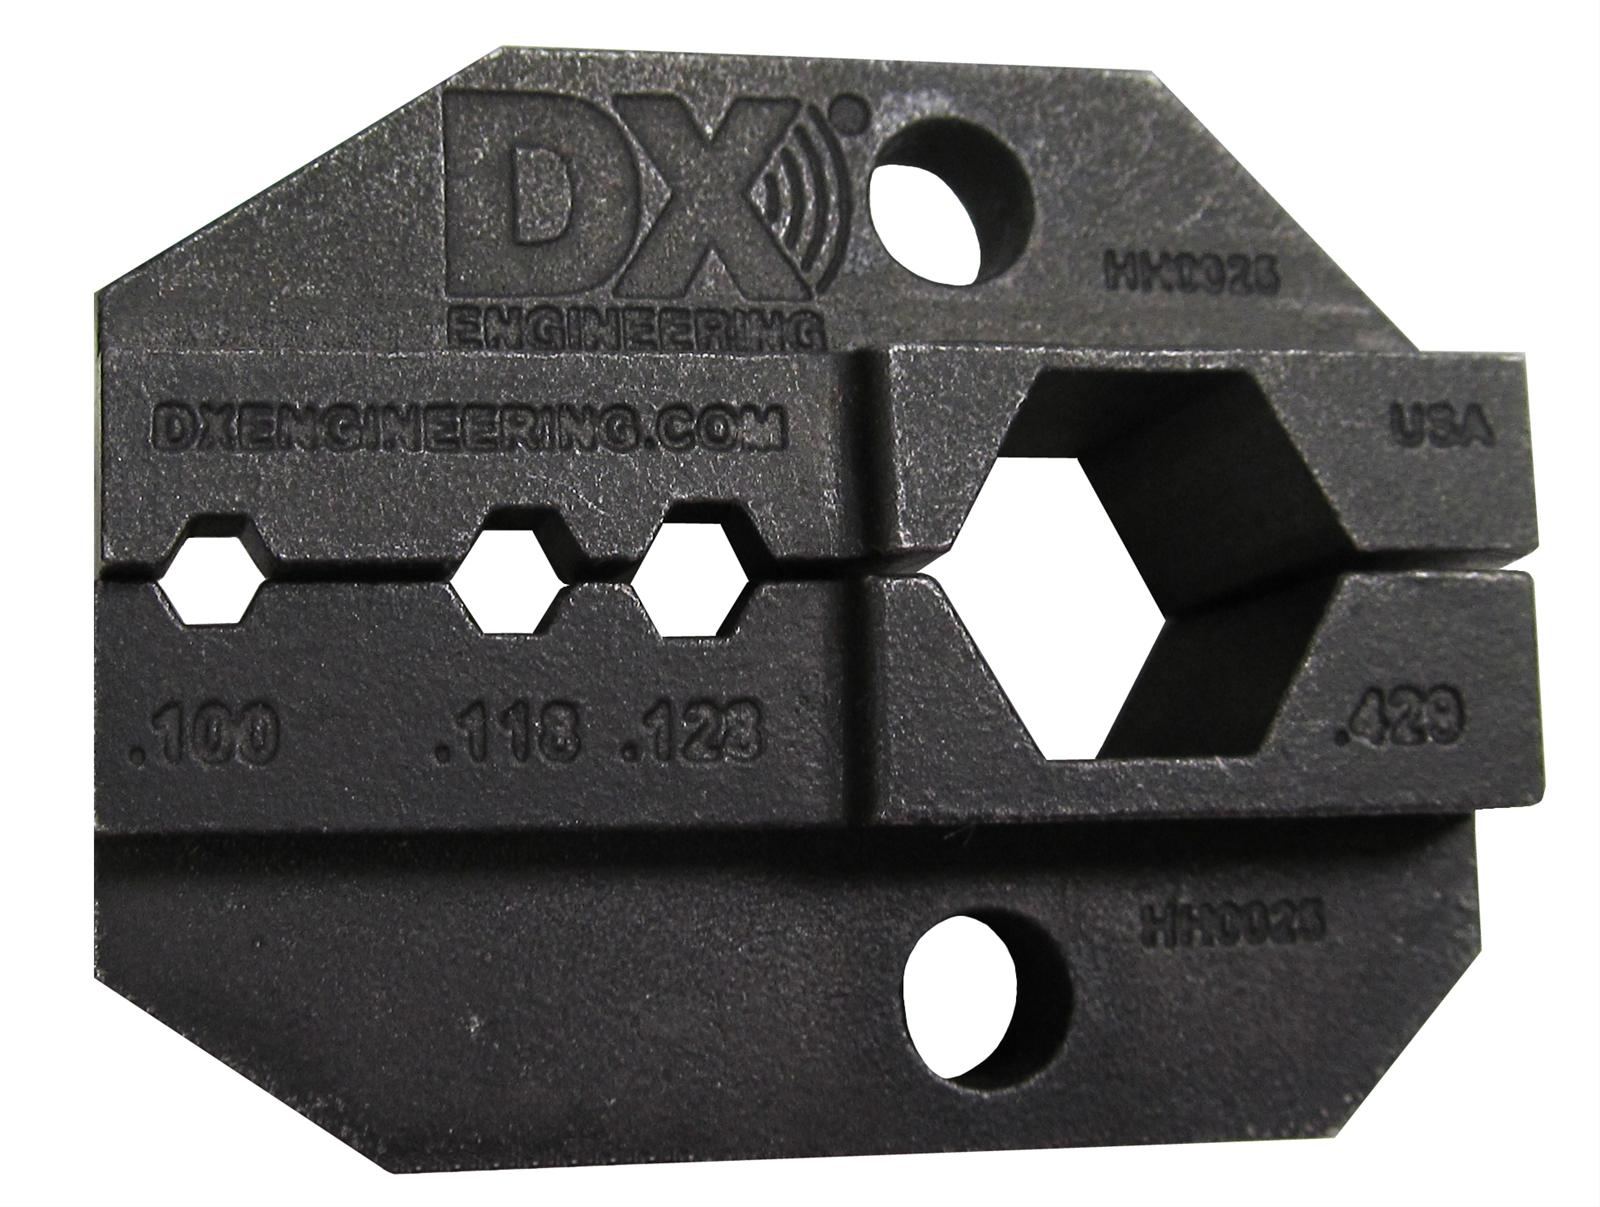 dx engineering crimp tool dies dxe ut die 8u free shipping on orders over 99 at summit racing. Black Bedroom Furniture Sets. Home Design Ideas